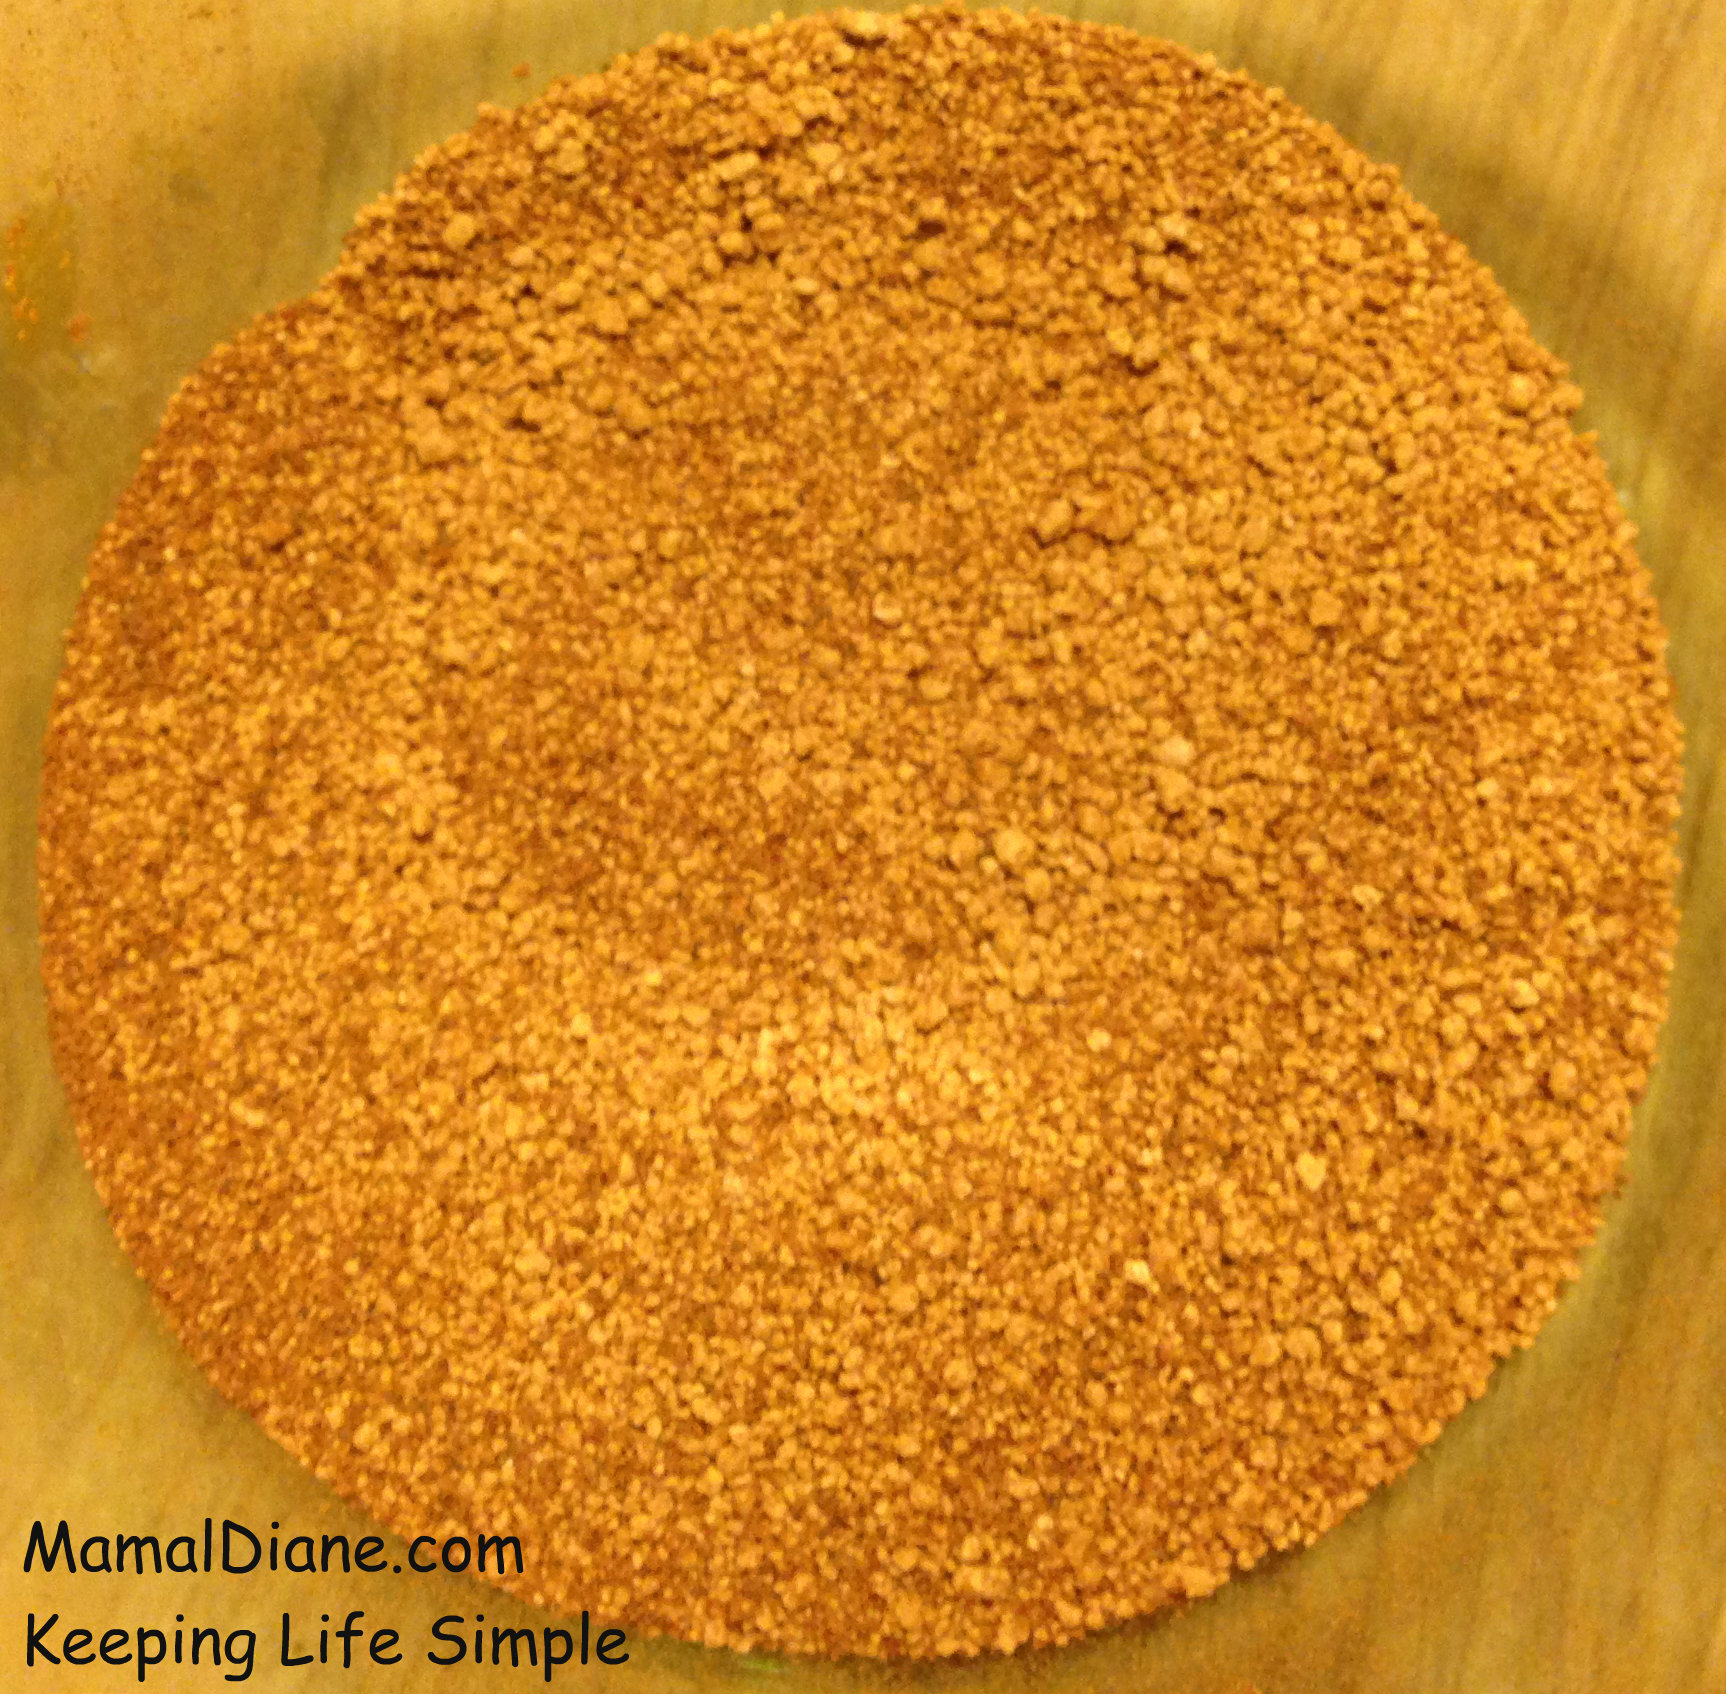 Sugar & Cinnamon Roasted Garbanzo Beans (Chickpeas) – Mamal Diane